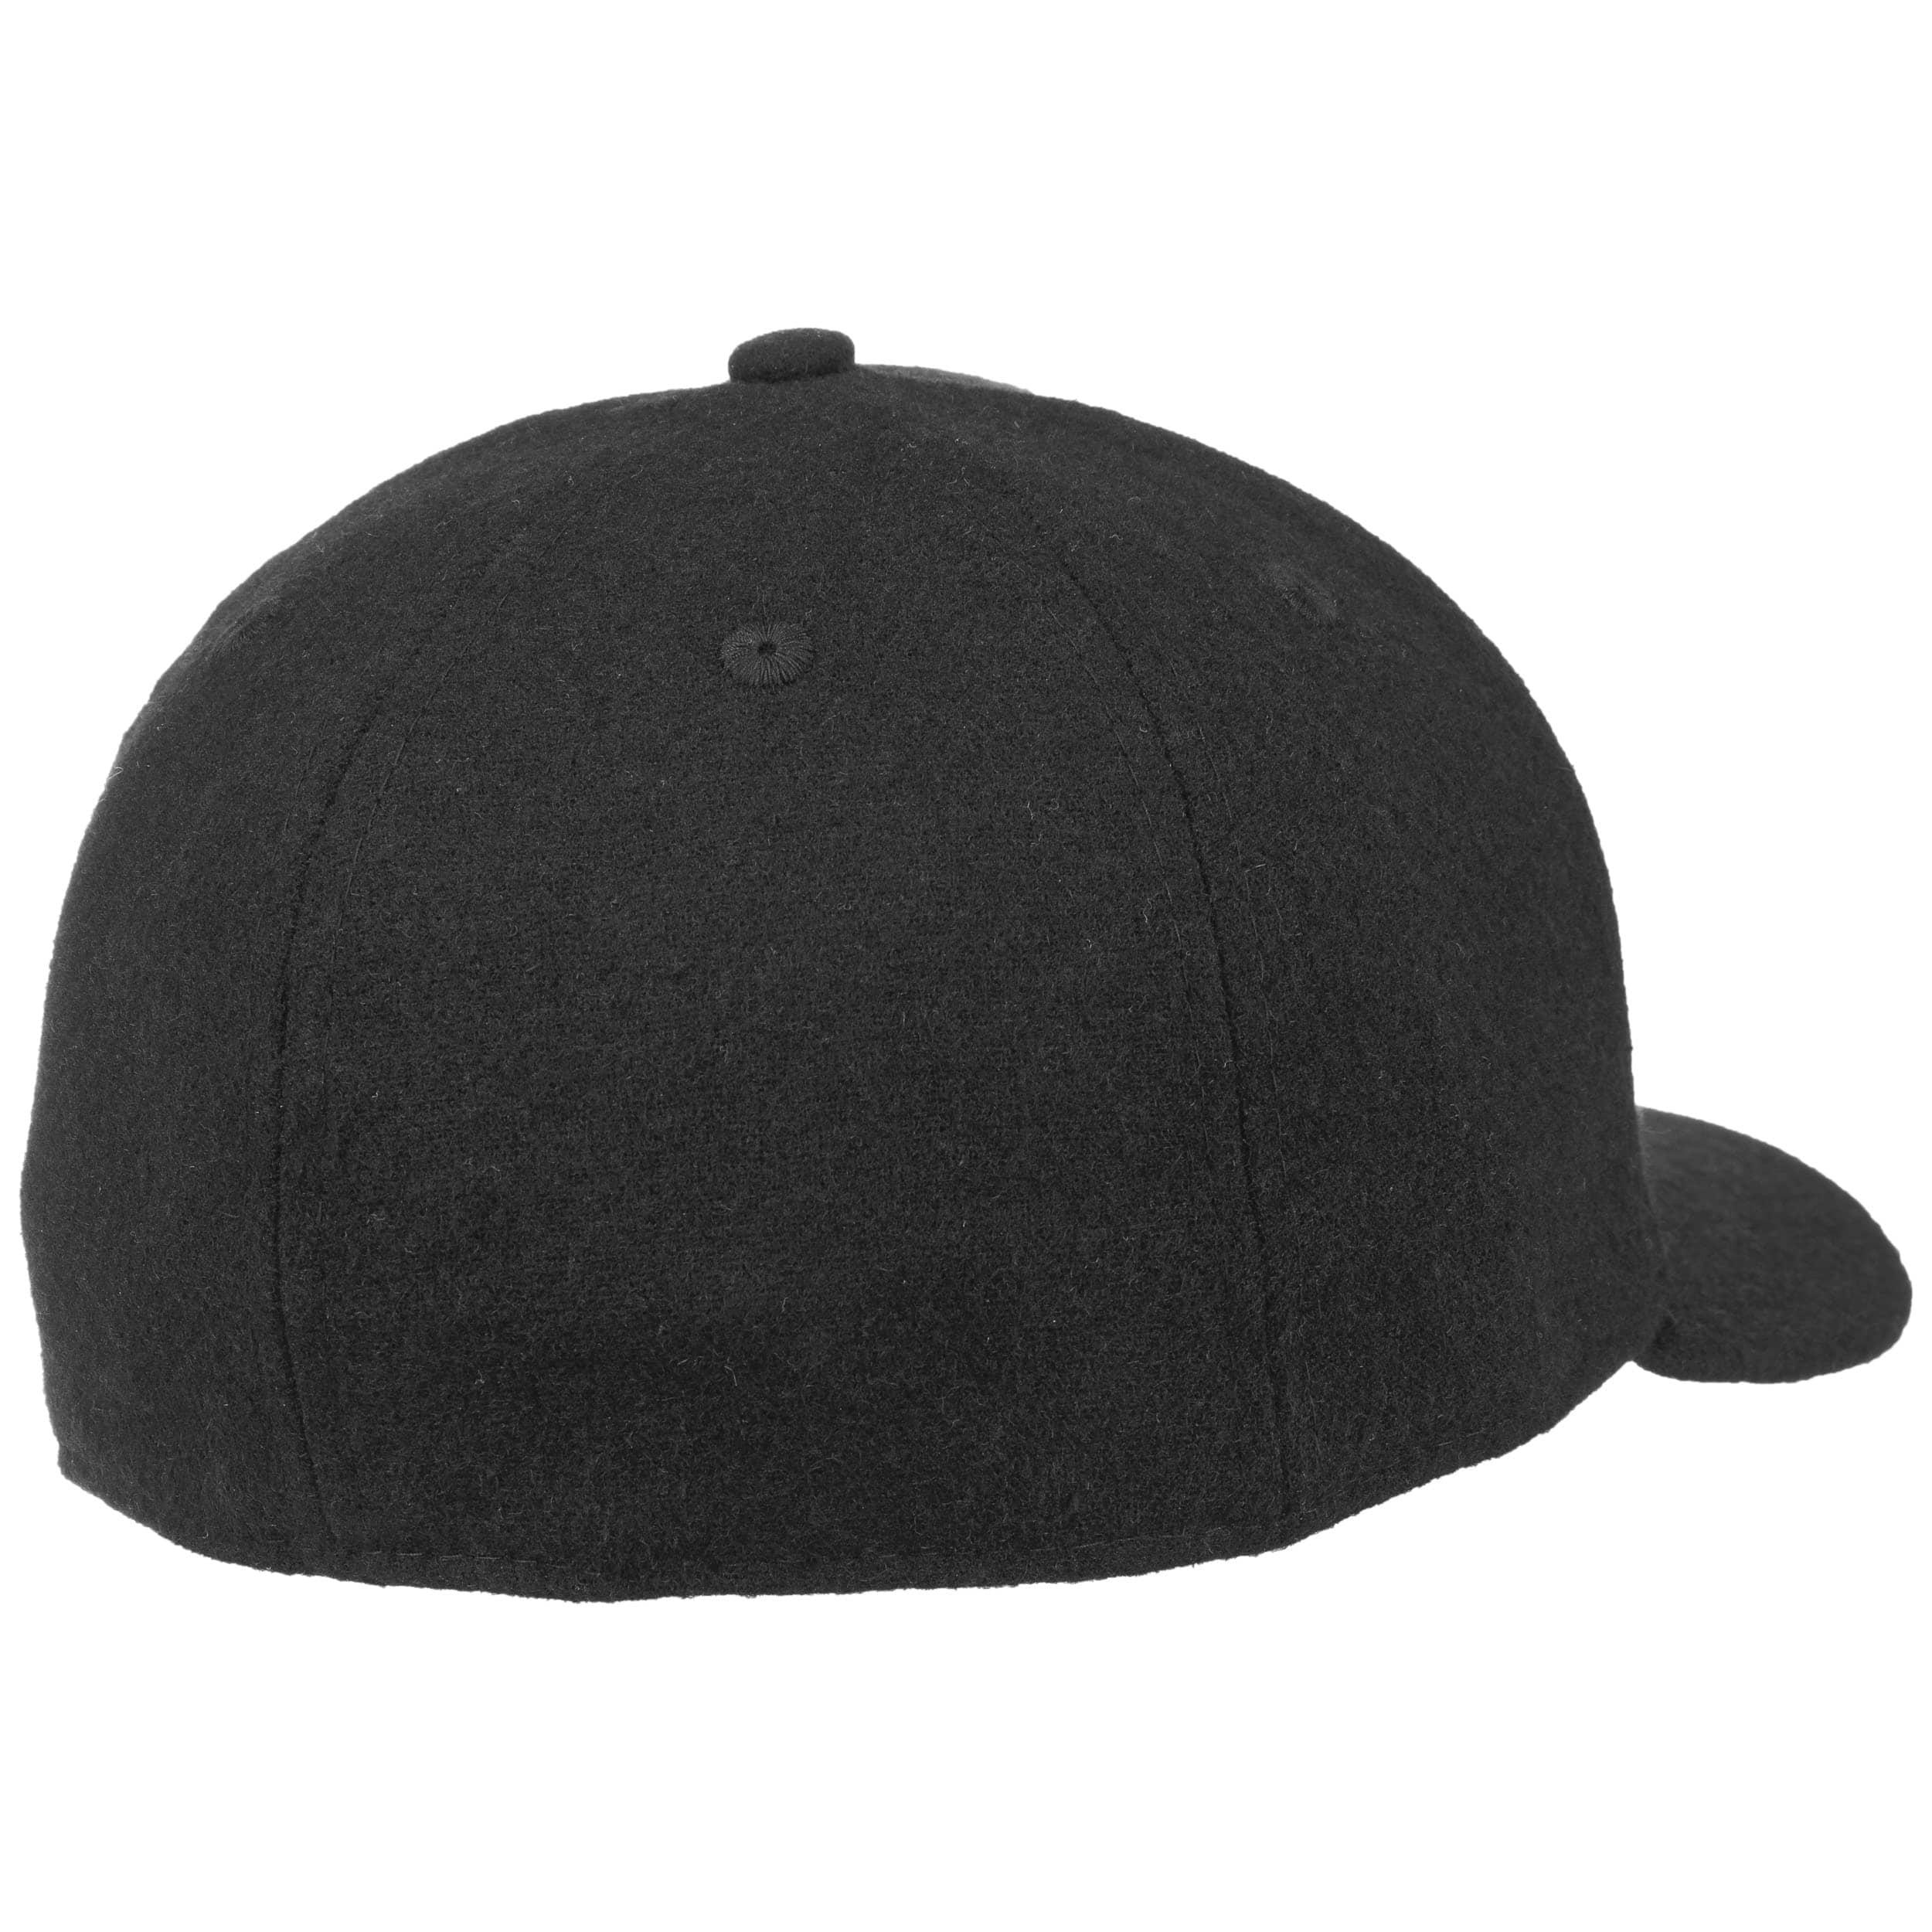 ... 59Fifty Low Profile Pin Bulls Cap by New Era - black 3 ... 060f5f5e299